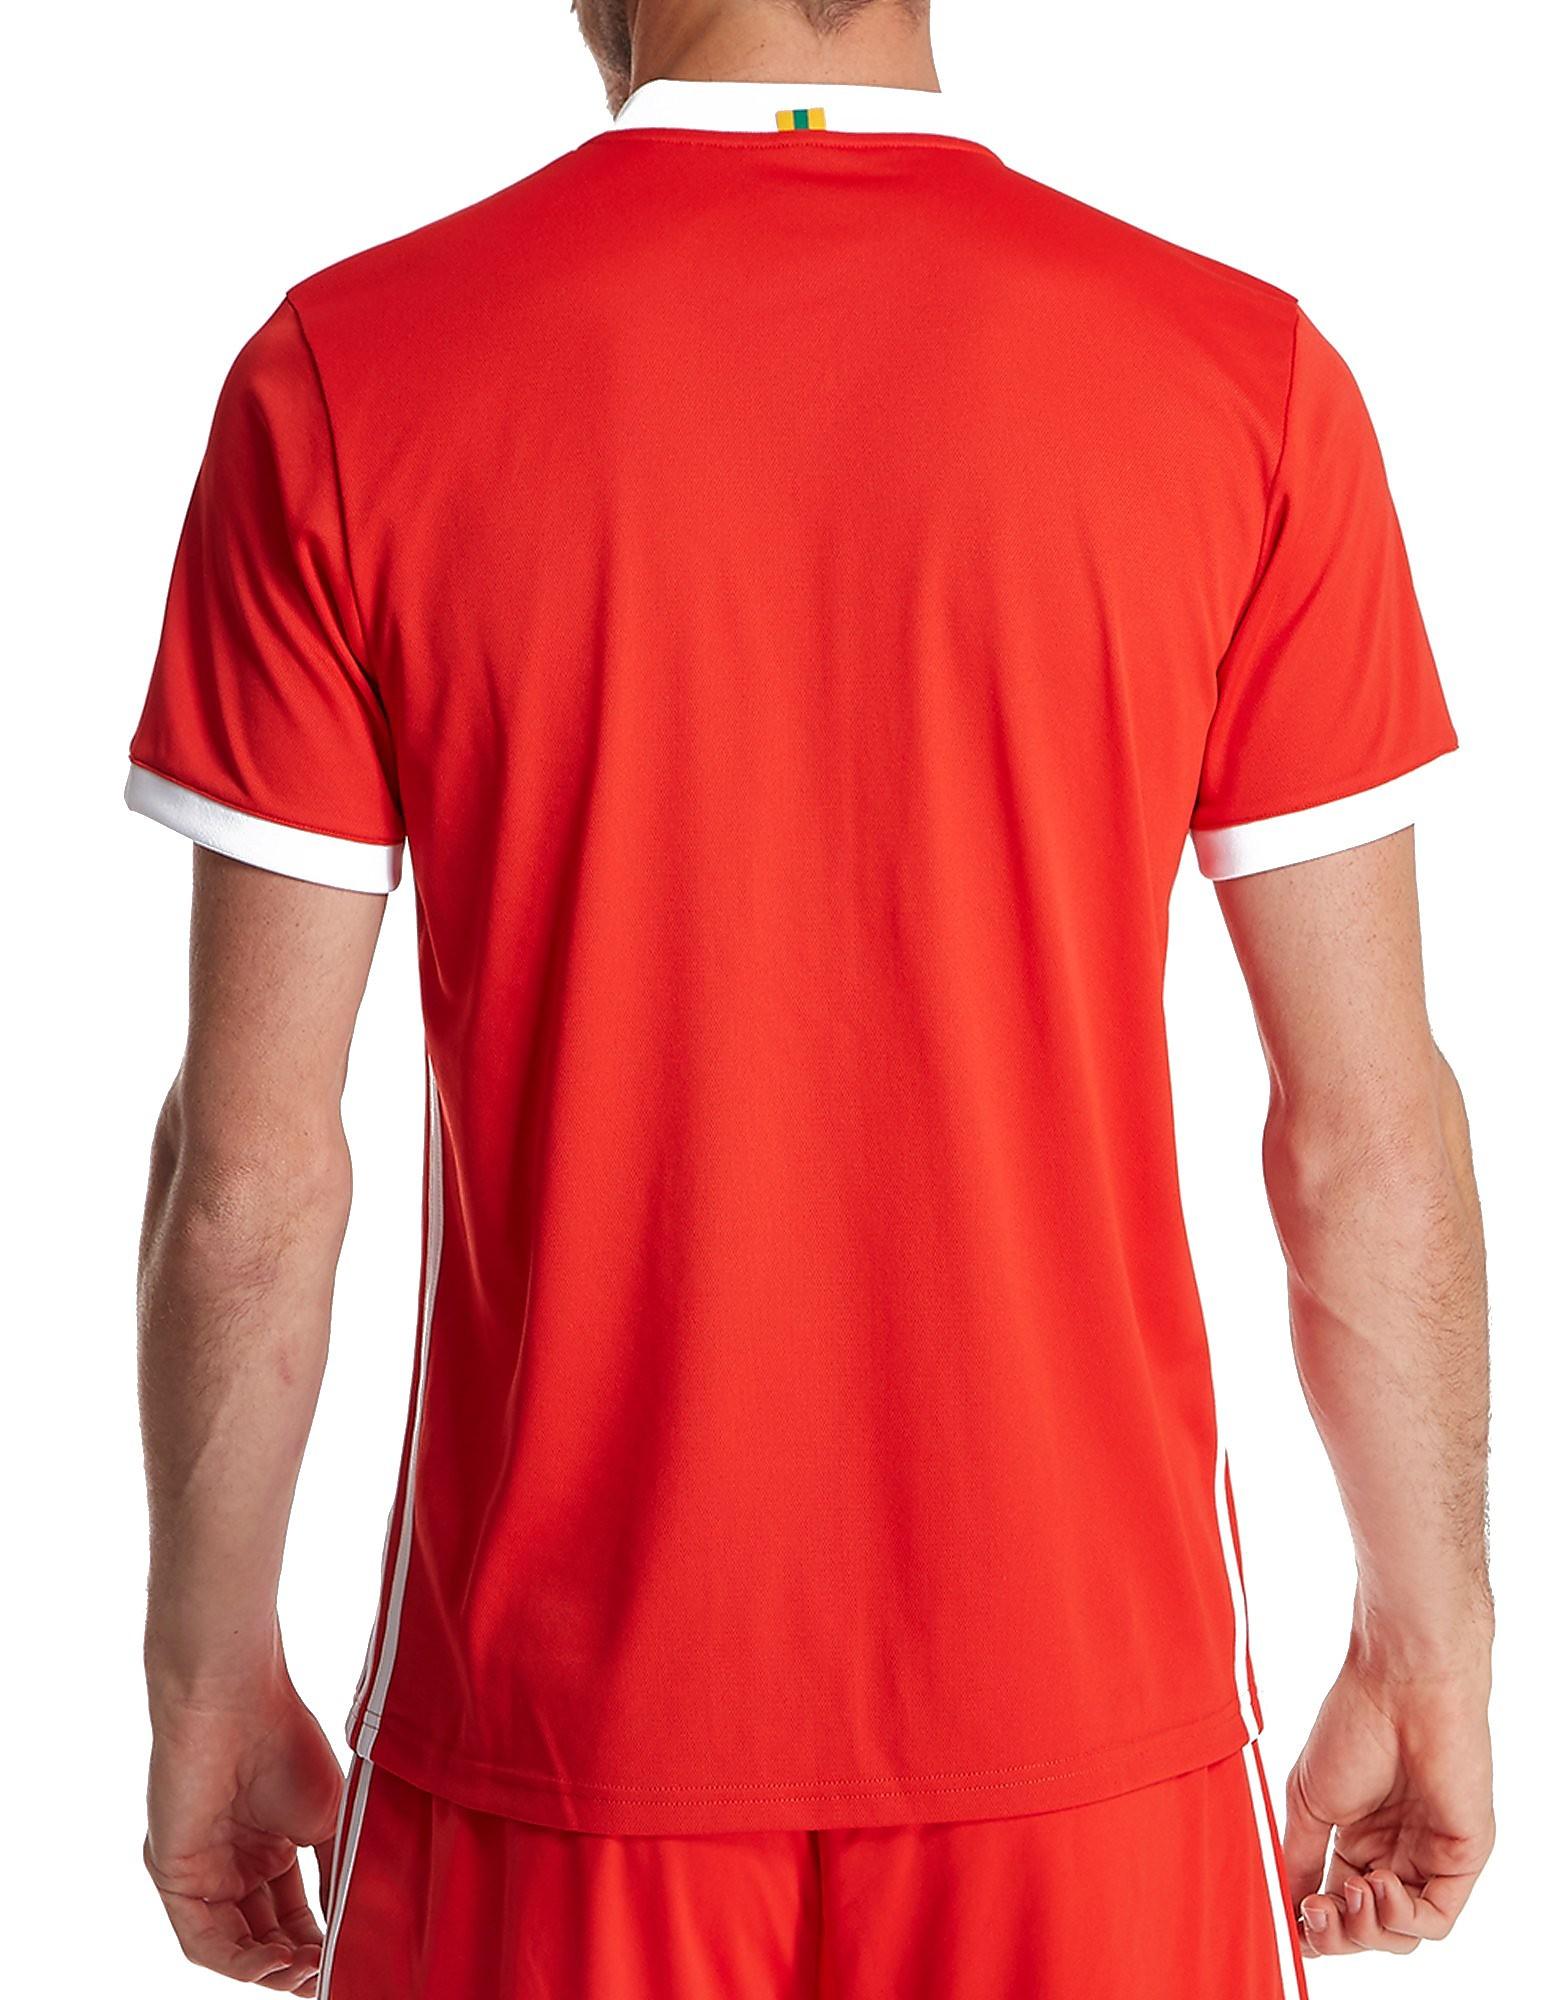 adidas Wales 2017/18 Home Shirt PRE ORDER